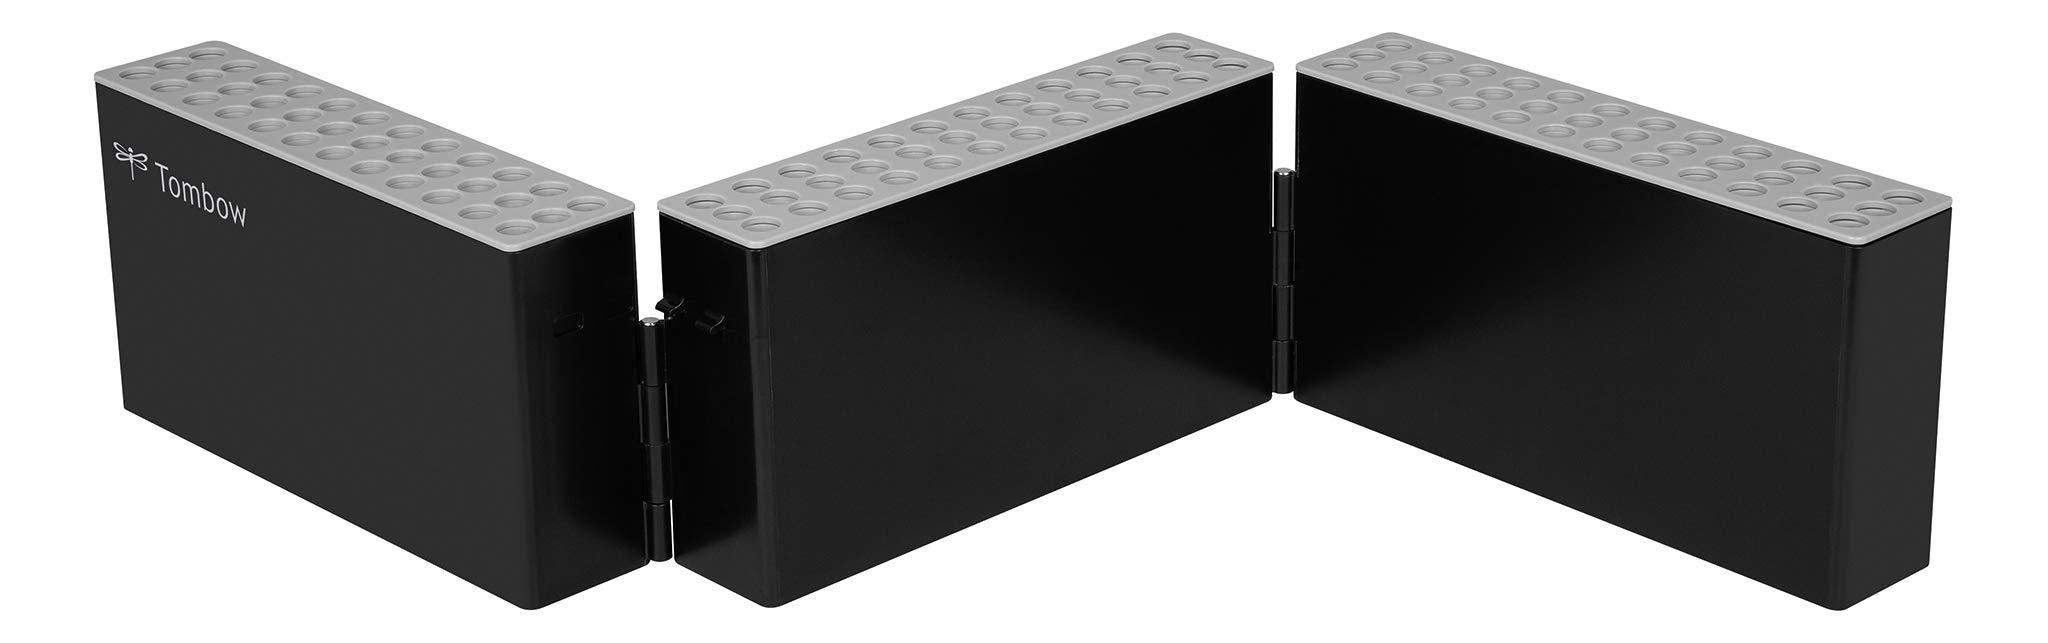 Tombow Case de ABT de 108 C lápices caja vacía: Amazon.es: Oficina ...